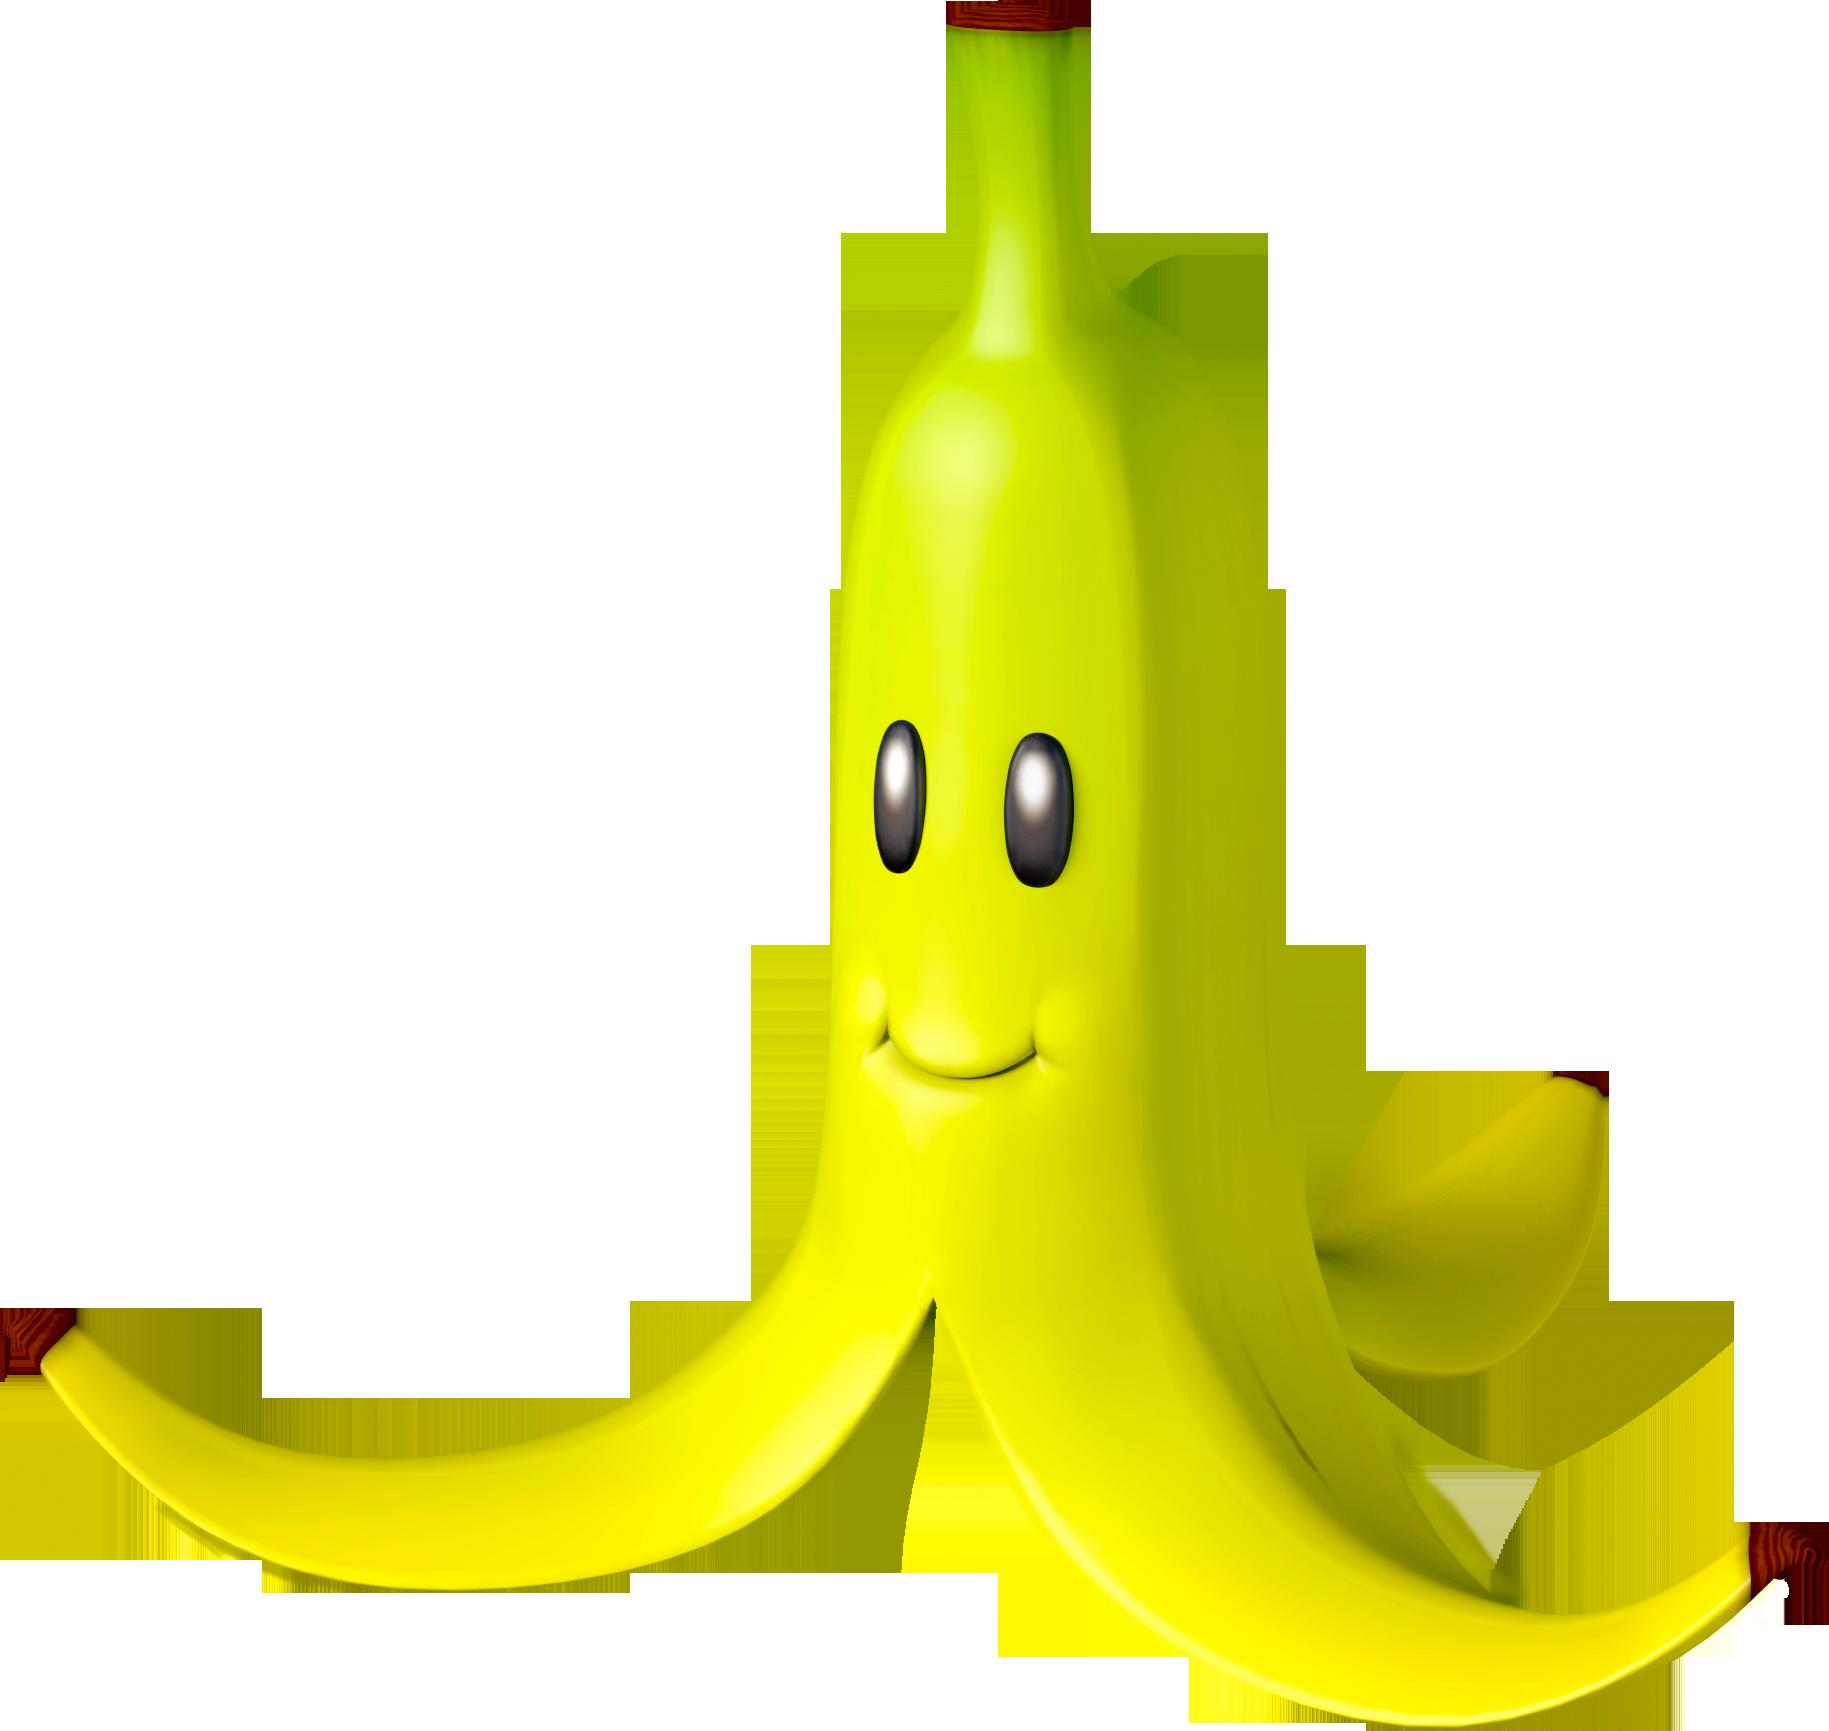 Banana Mario Kart 8 Png Super Mario Kart Mario Kart Mario Bros Party